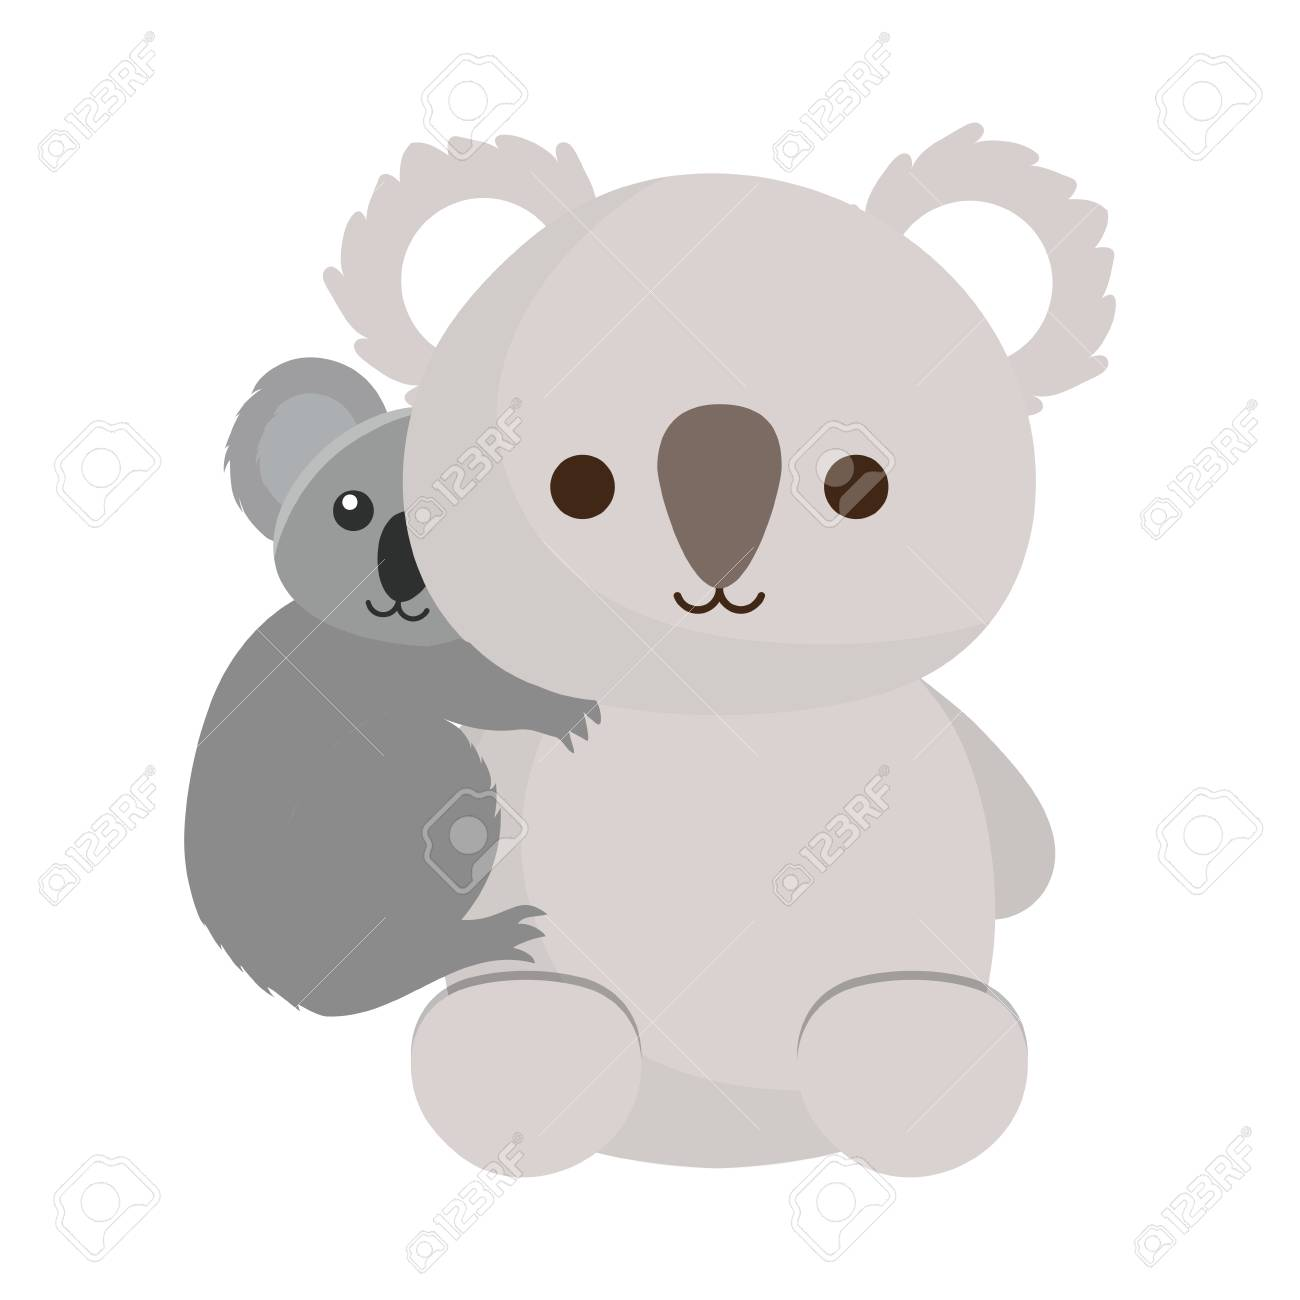 Icone Koala Et Bebe Koala Mignon Sur Fond Blanc Illustration Vectorielle Design Colore